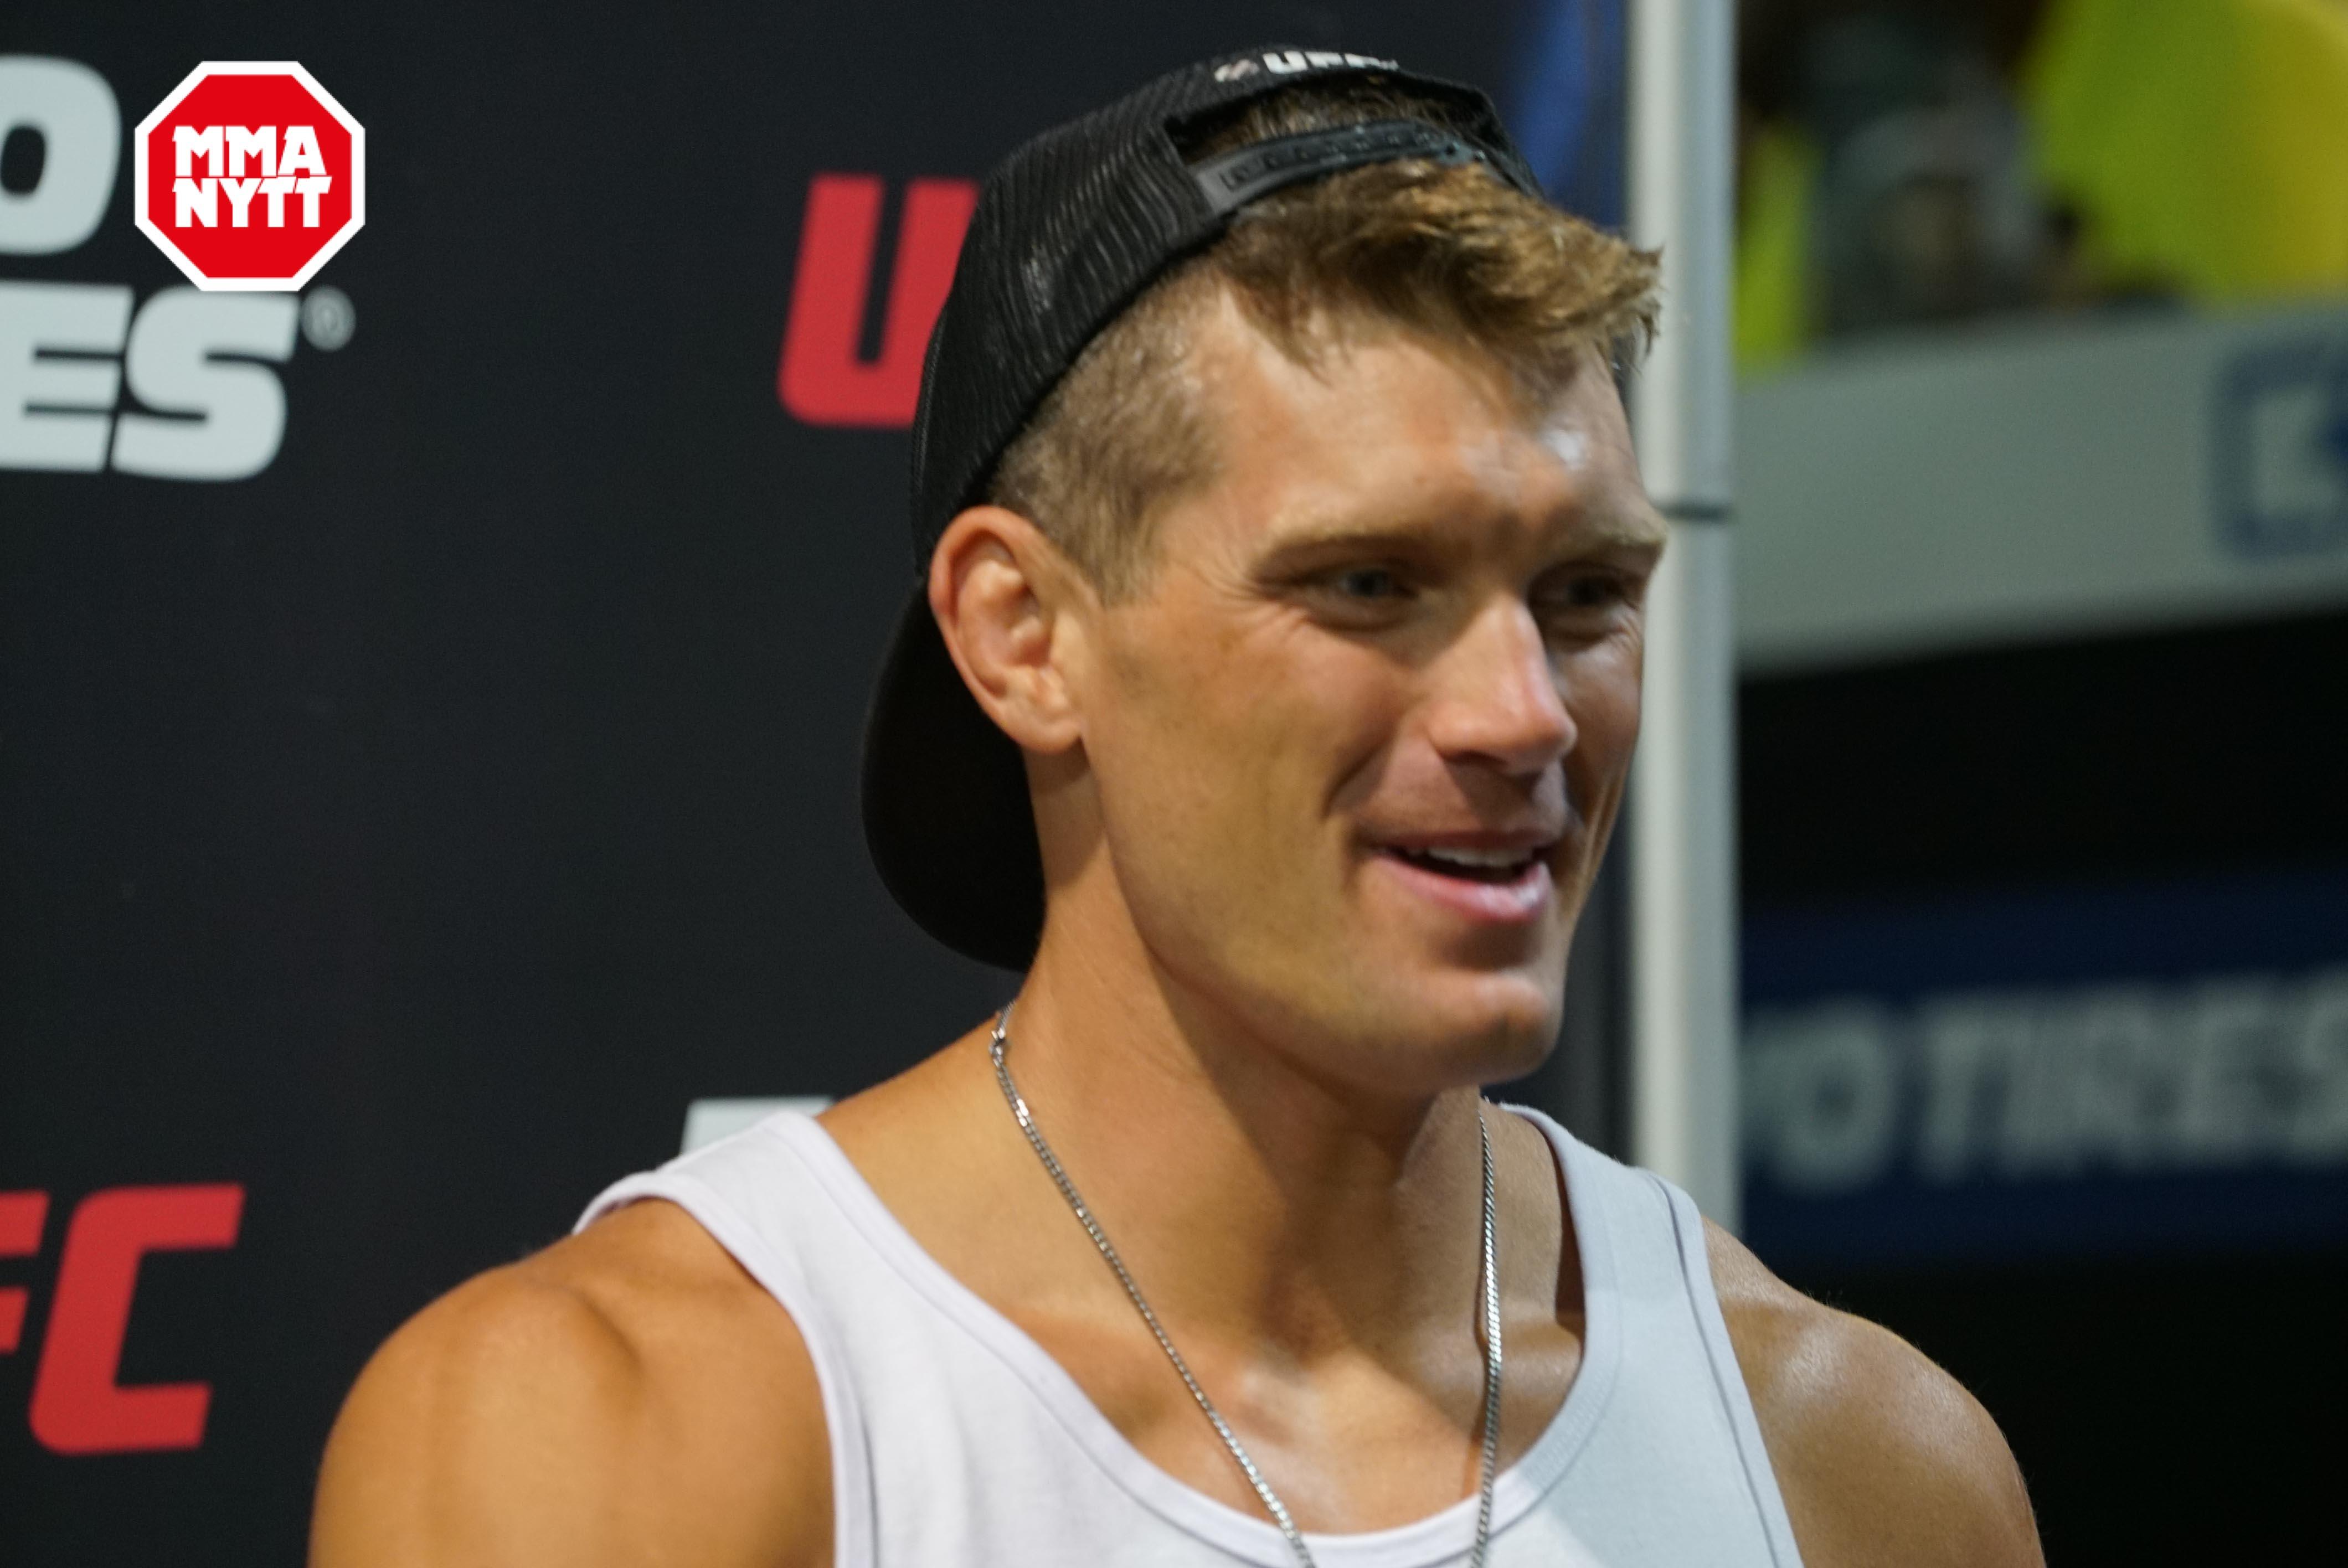 UFC 200 Las Vegas 2016-07-09 Stephen Thompson photo MMAnytt.se Vince Cachero (11 of 98)